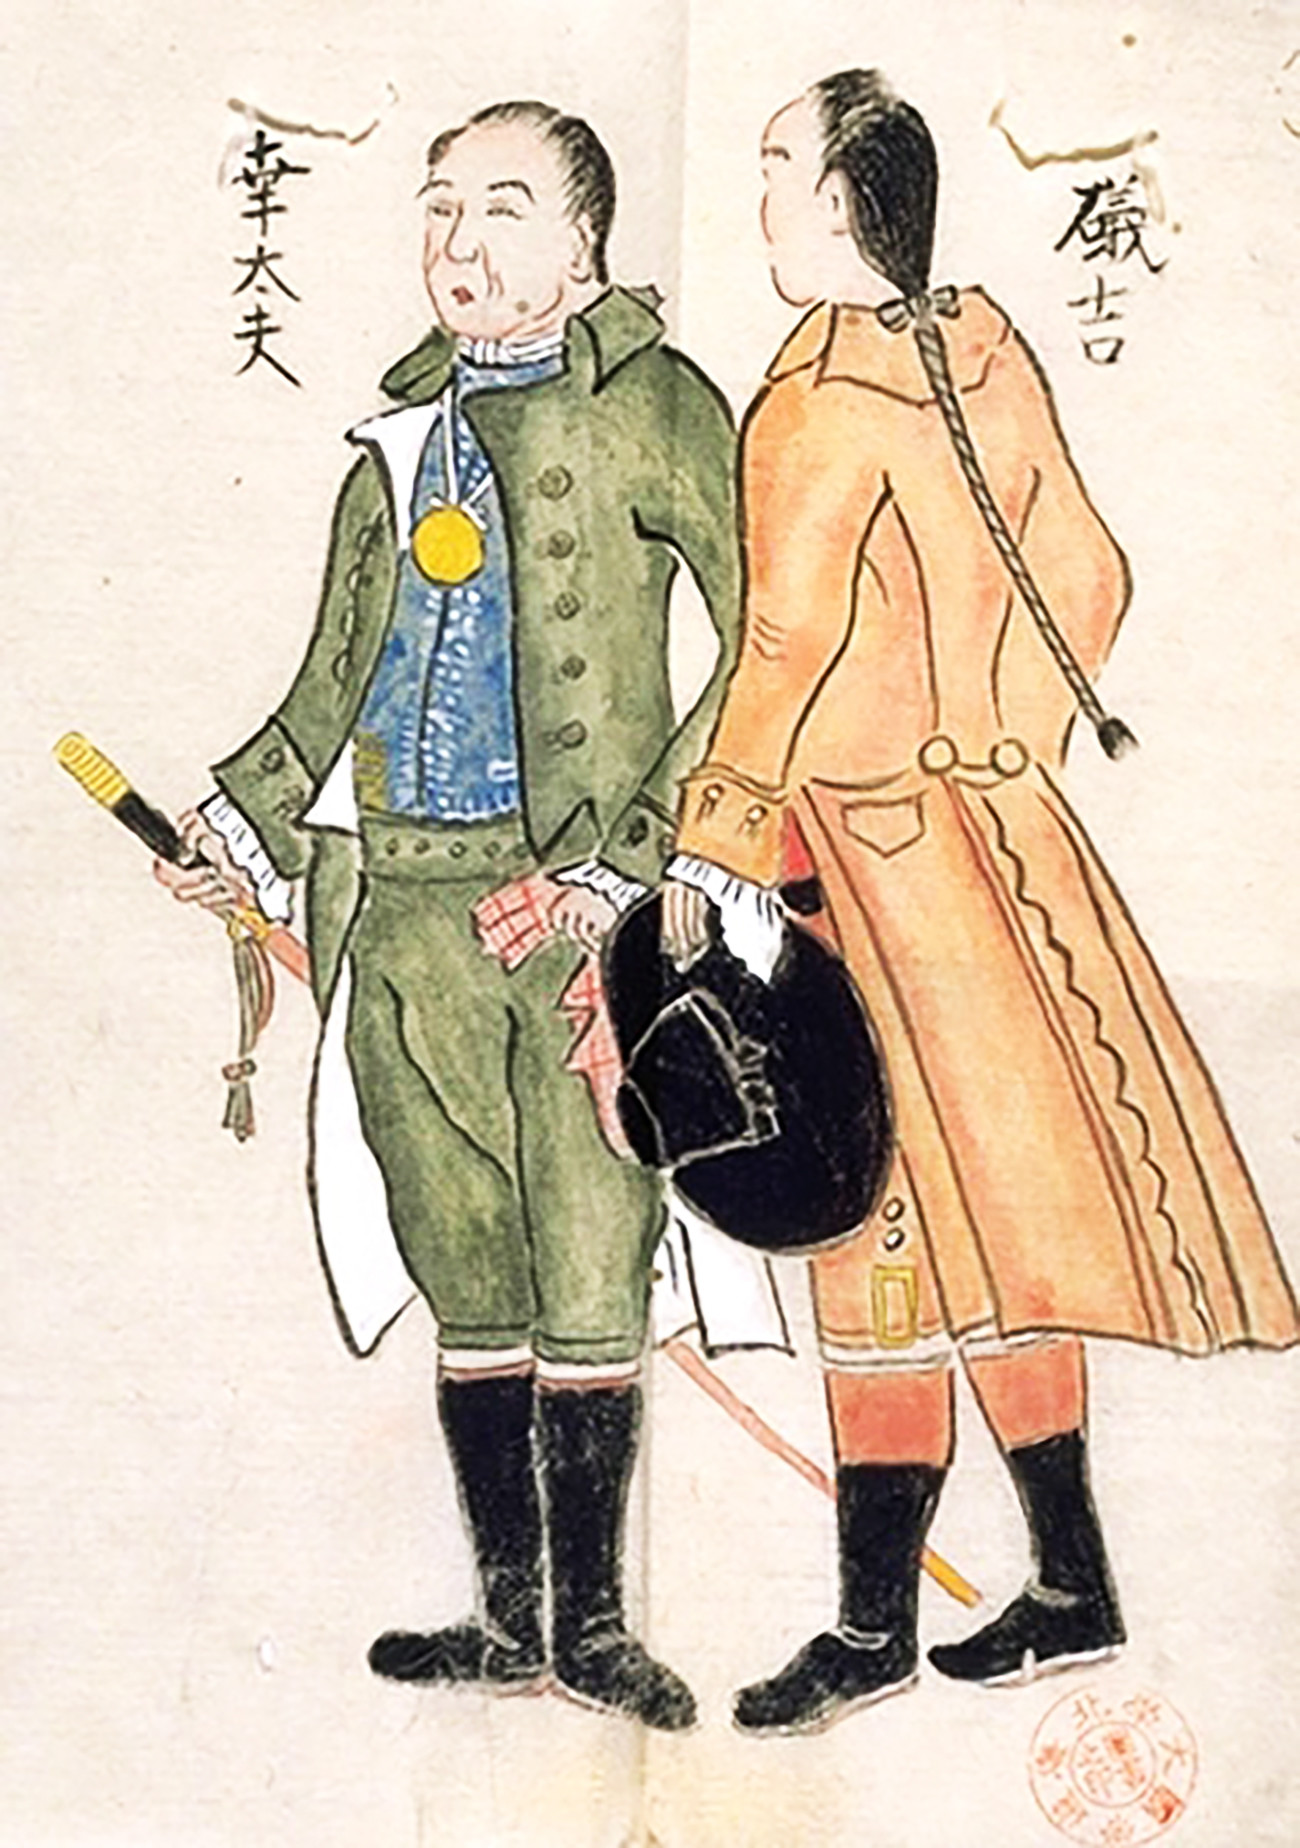 Kembalinya Kodayu dan Isokichi, Dua Korban Kapal Karam dari Jepang, karya Adam Laxman, 1792.